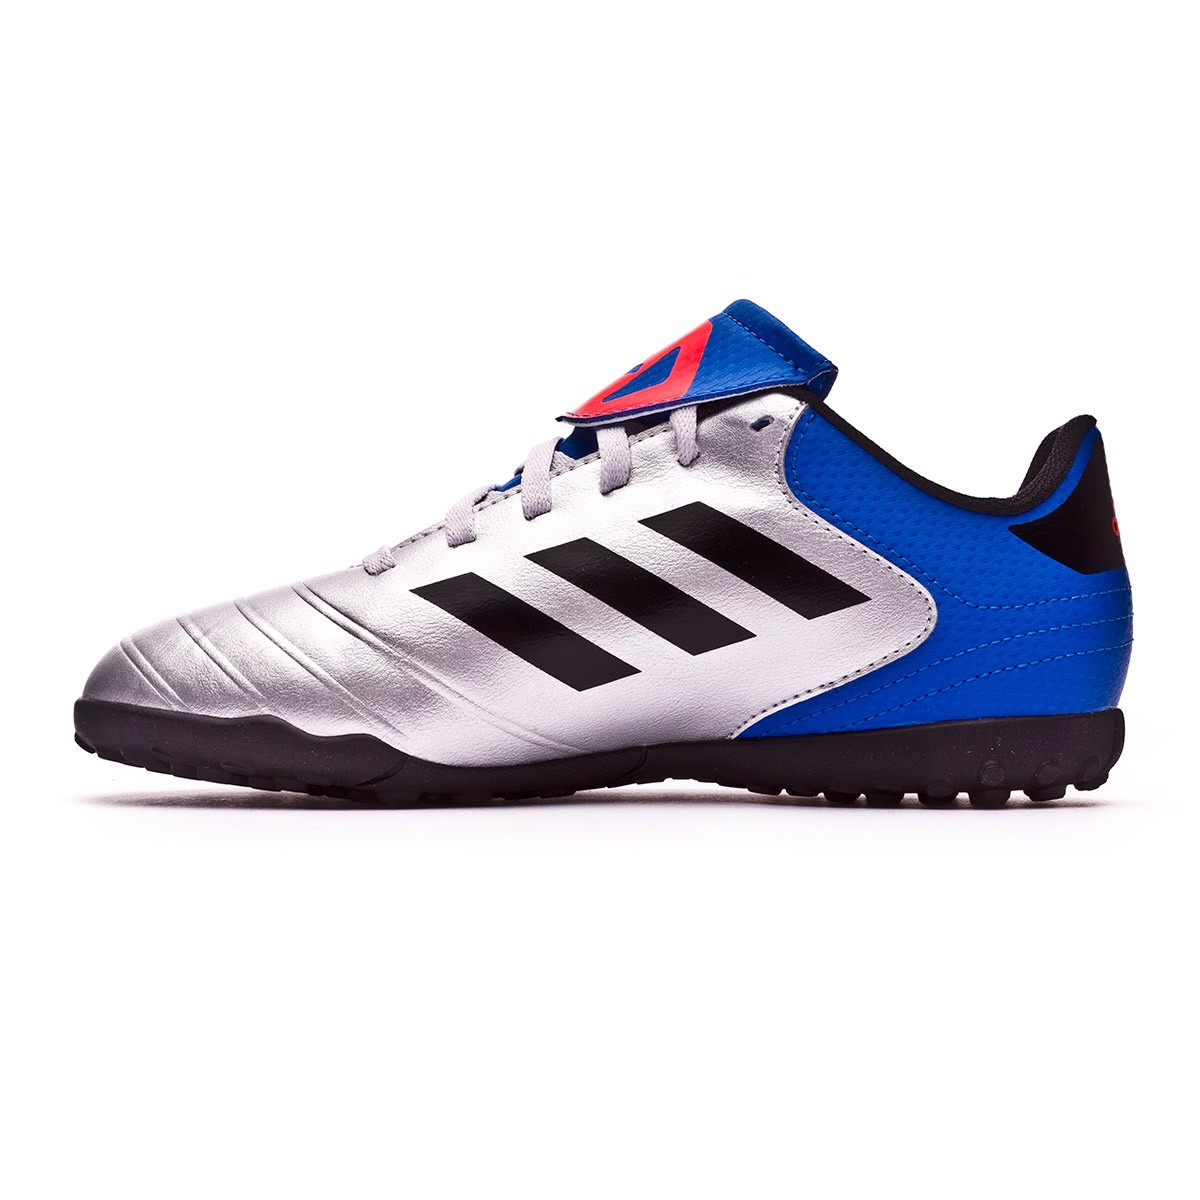 buy online 53db4 38360 Football Boot adidas Kids Copa Tango 18.4 Turf Silver metallic-Core black-Football  blue - Football store Fútbol Emotion